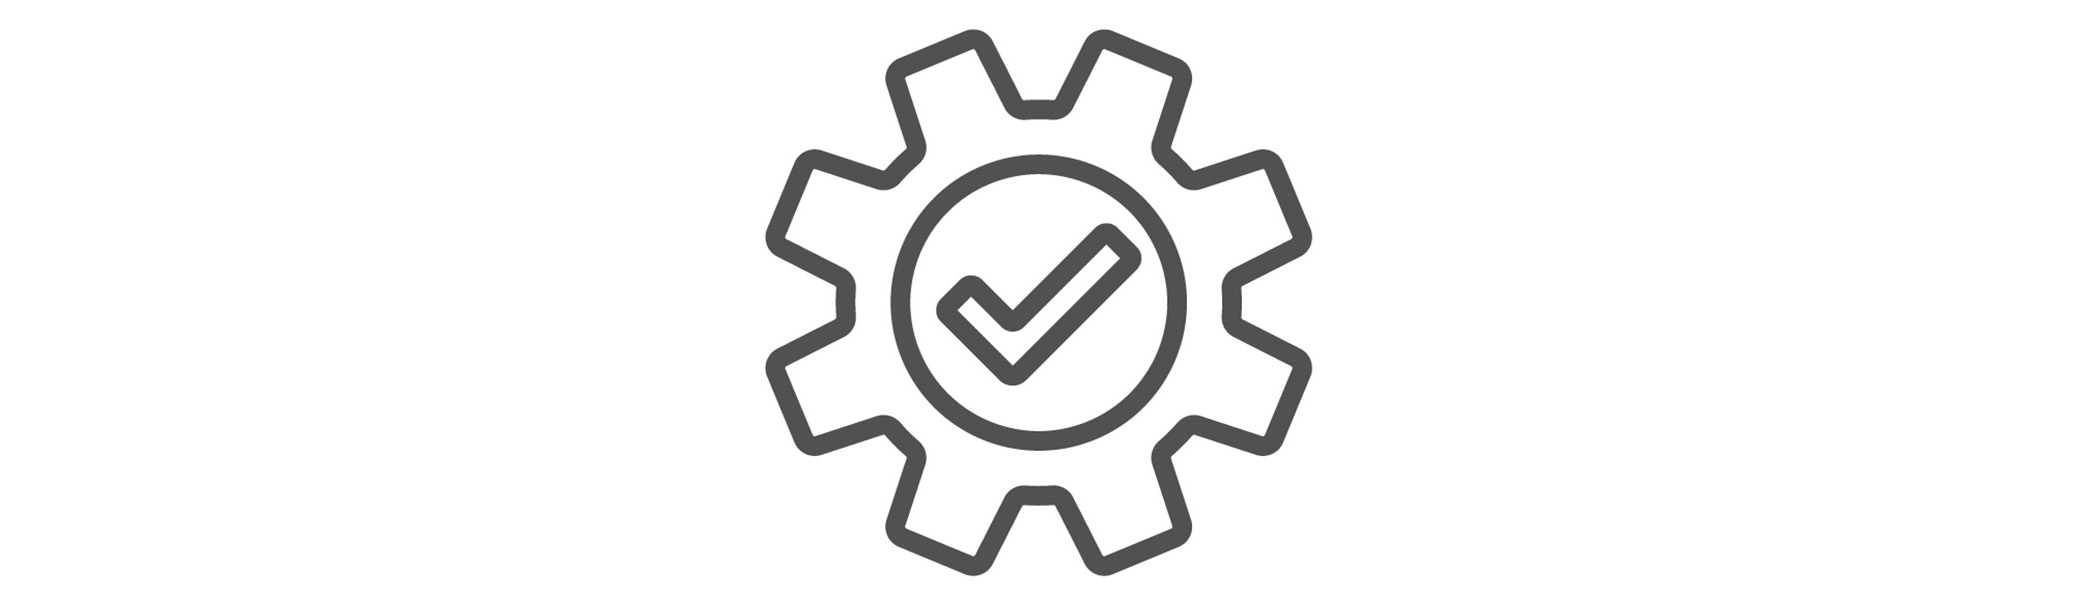 iStock-icons 880845422.jpg